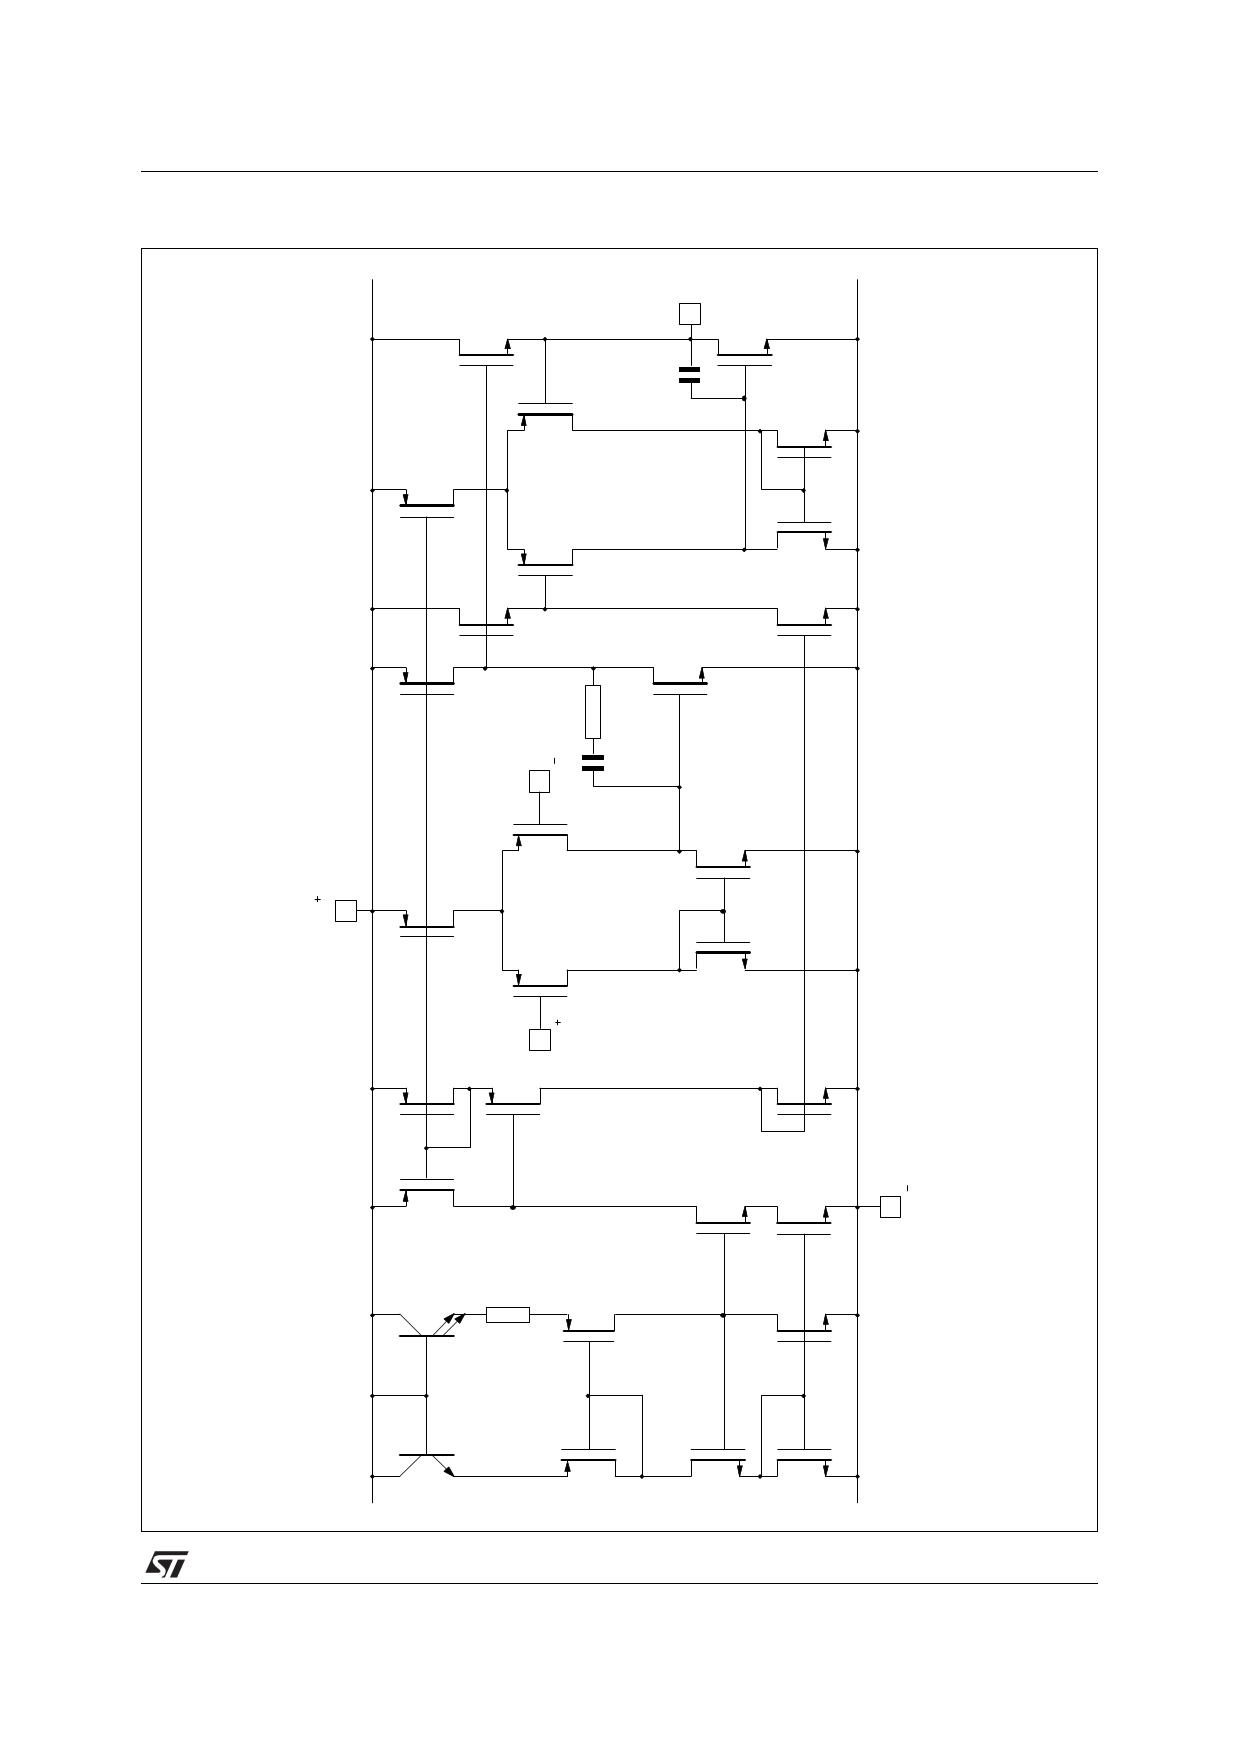 TS272BC pdf, ピン配列